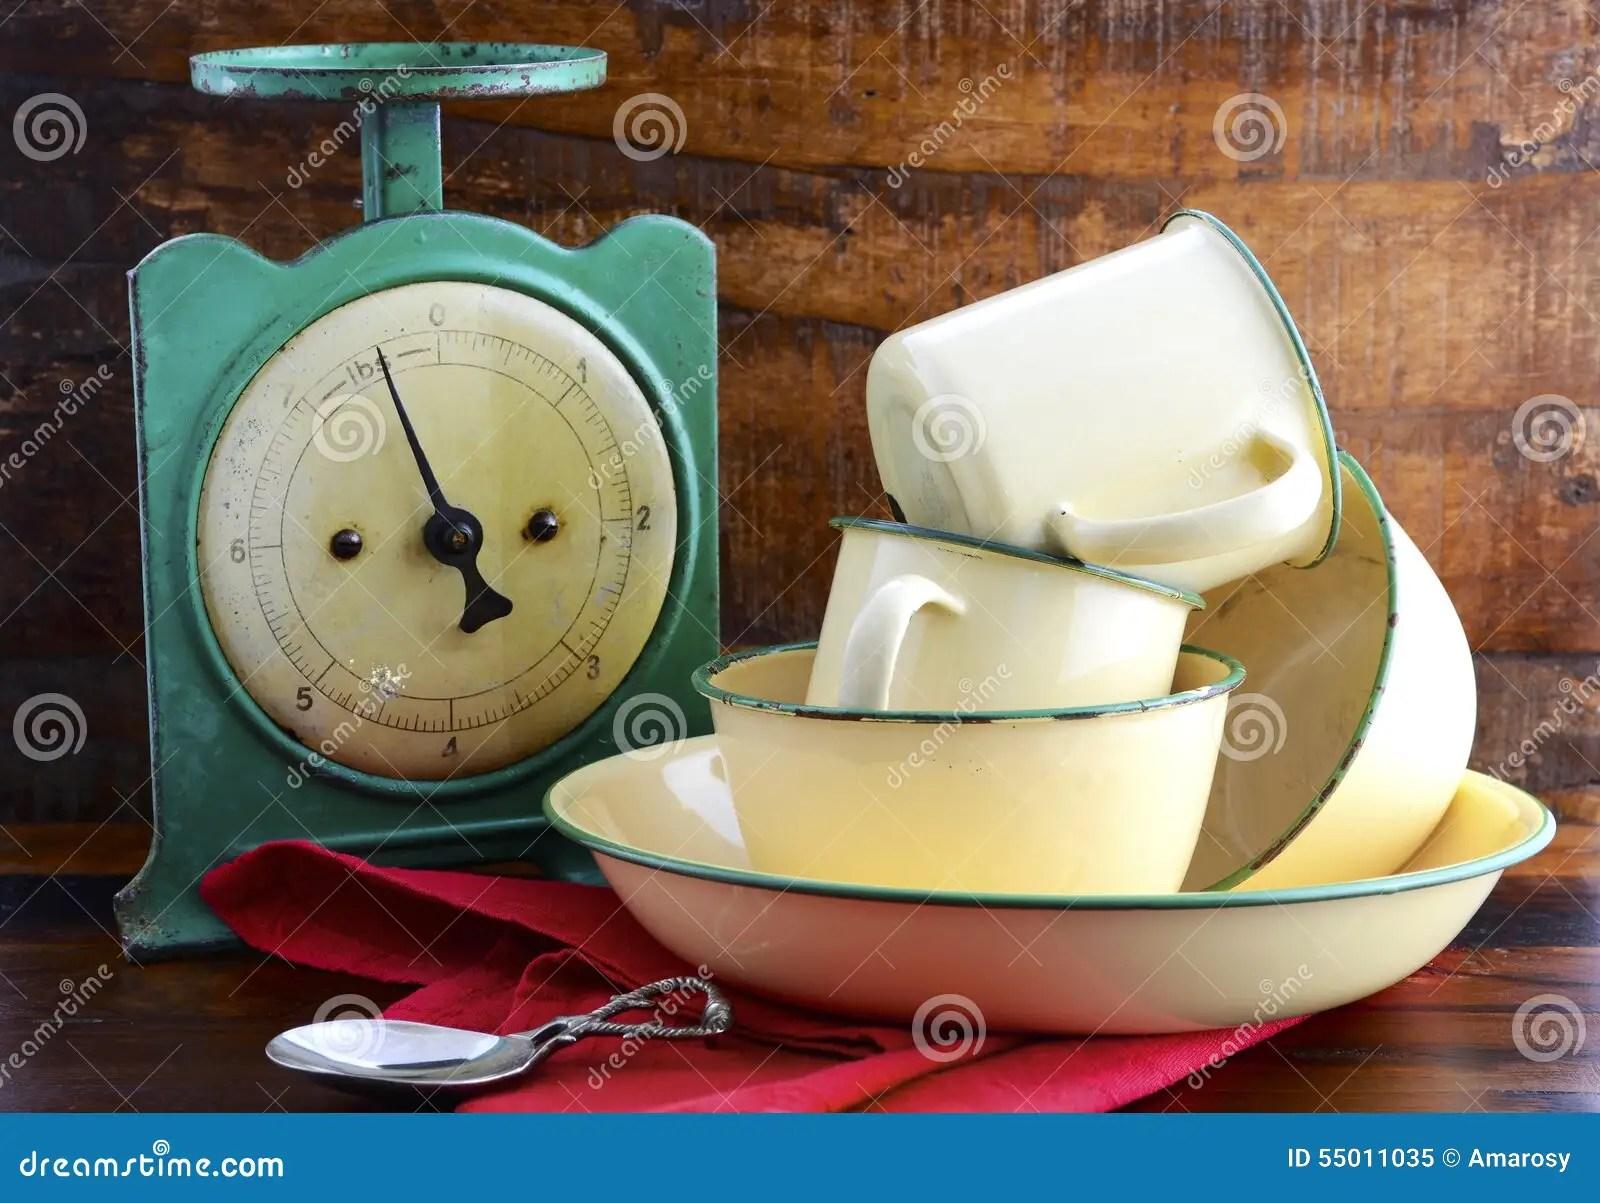 kitchen jars ikea table and chairs set 葡萄酒厨房标度和罐子杯子和平底锅库存图片 图片包括有装饰 年龄 餐具 葡萄酒厨房标度和罐子杯子和平底锅